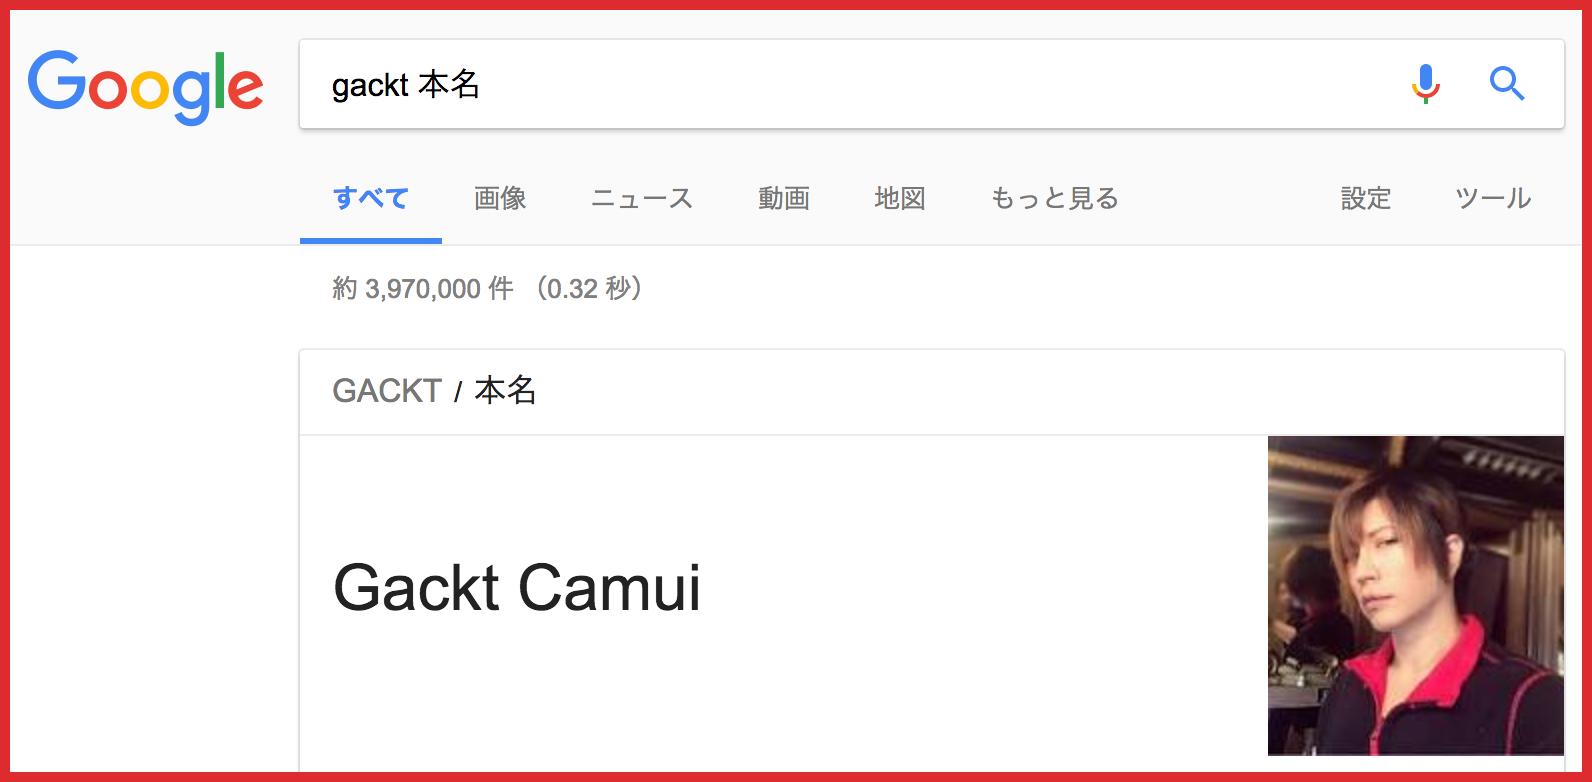 GACKTの本名は意外なところで判明!